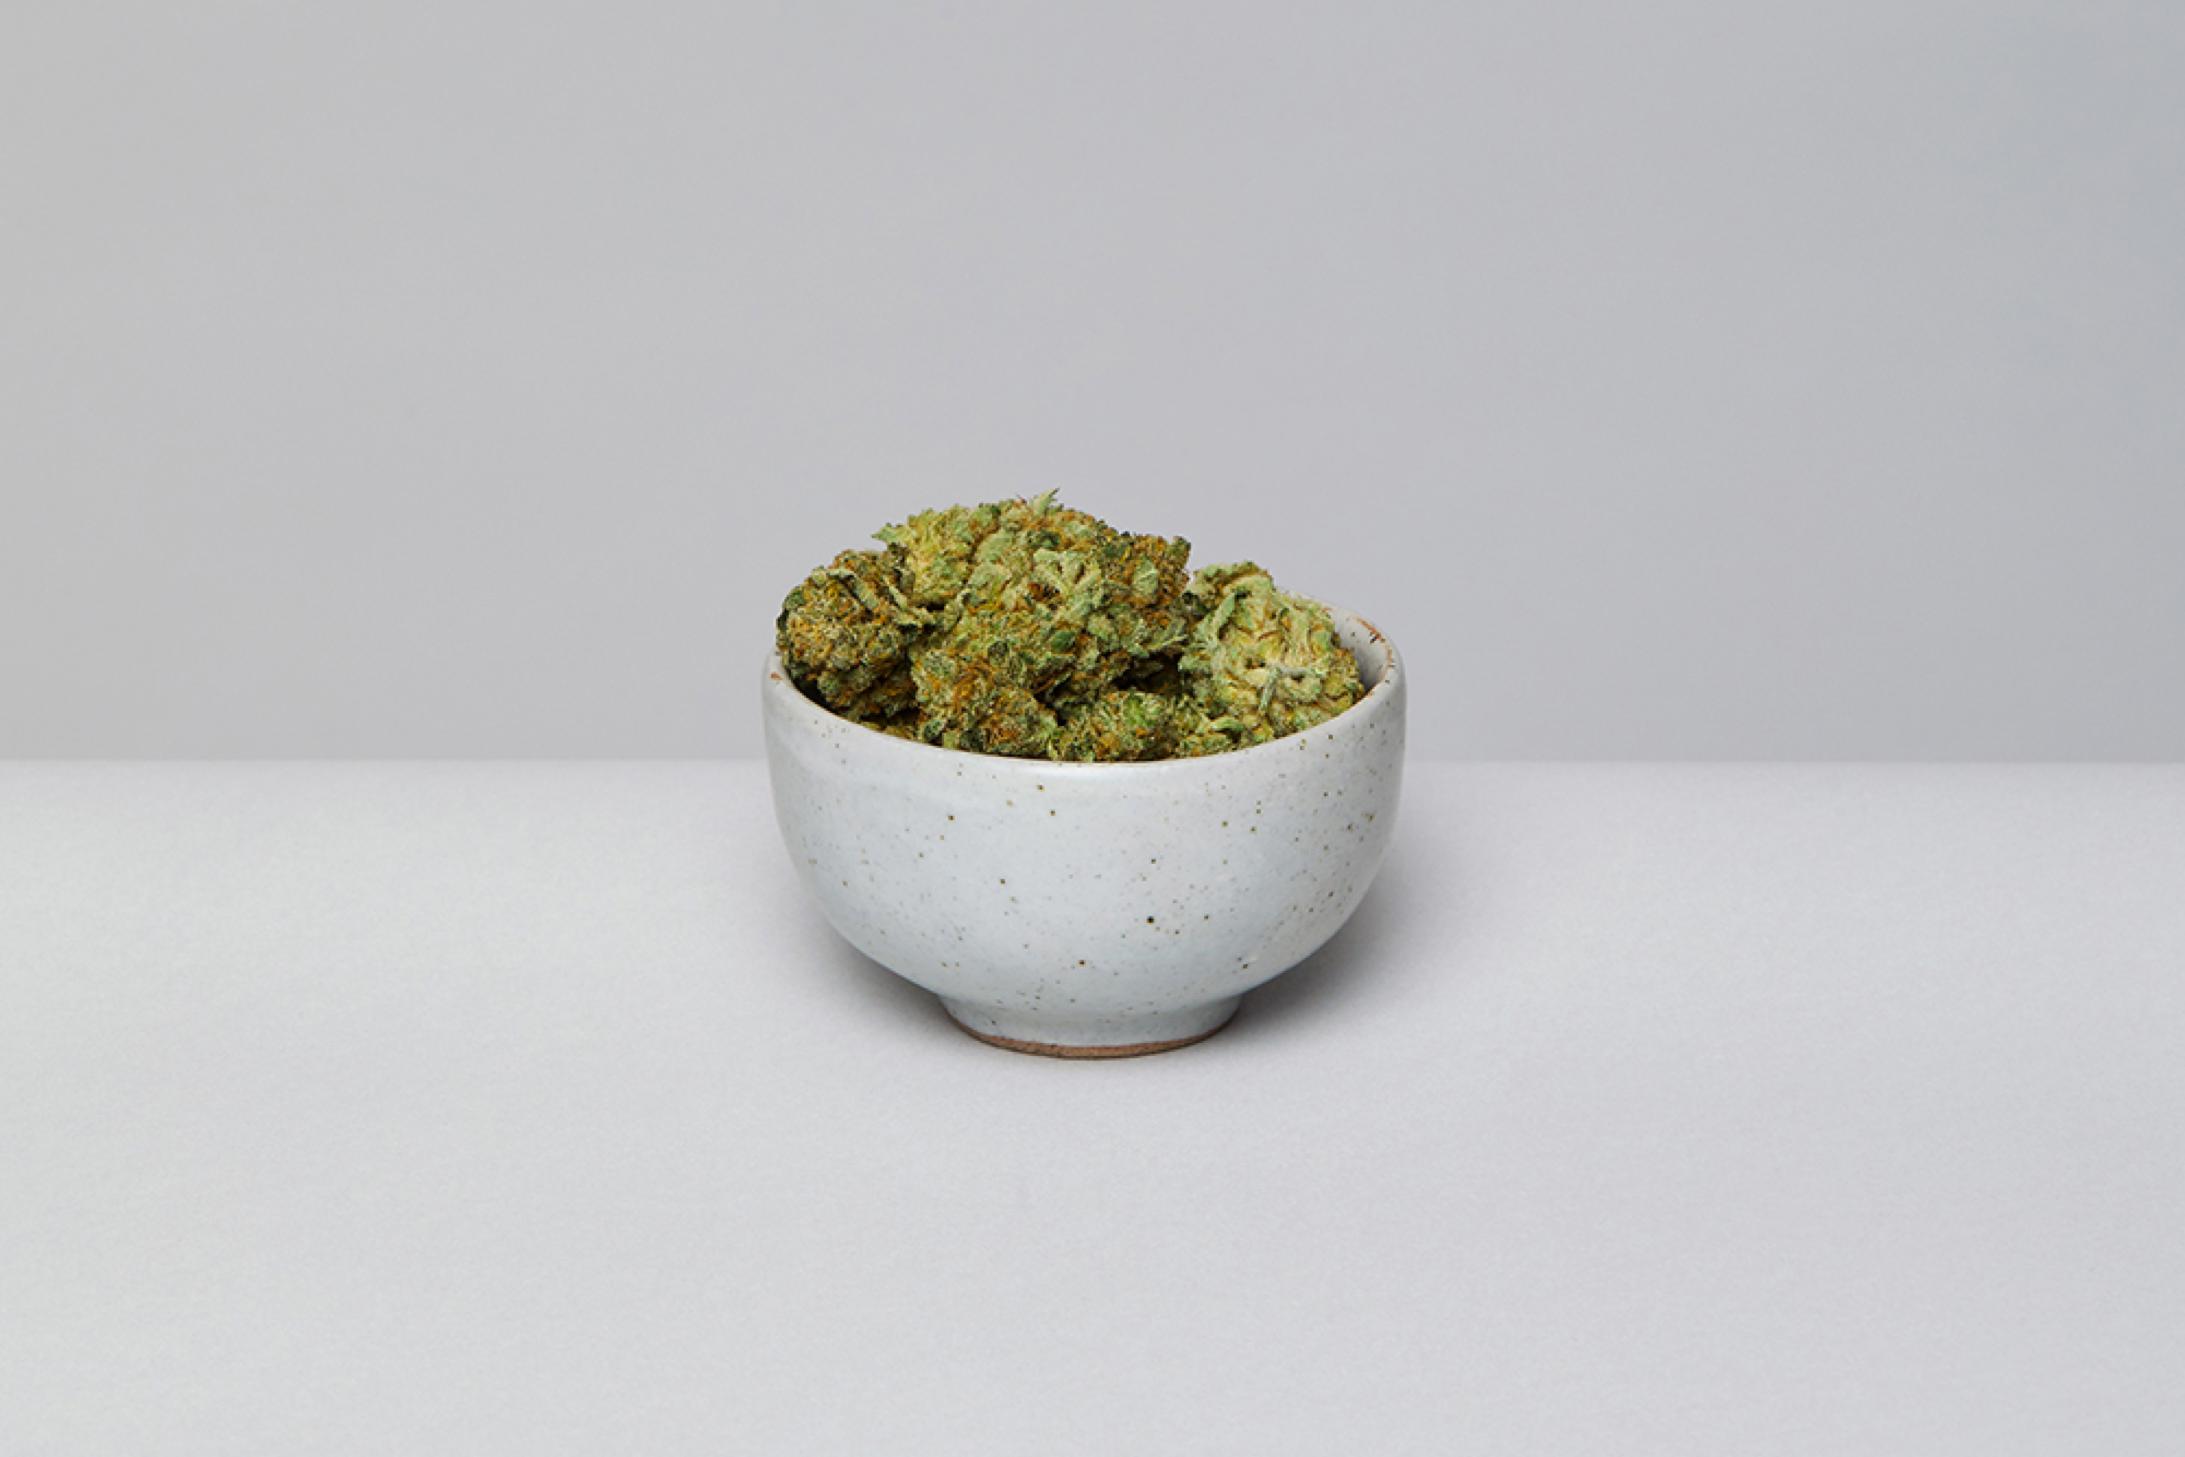 premium, hand-trimmed, non-irradiated cannabis